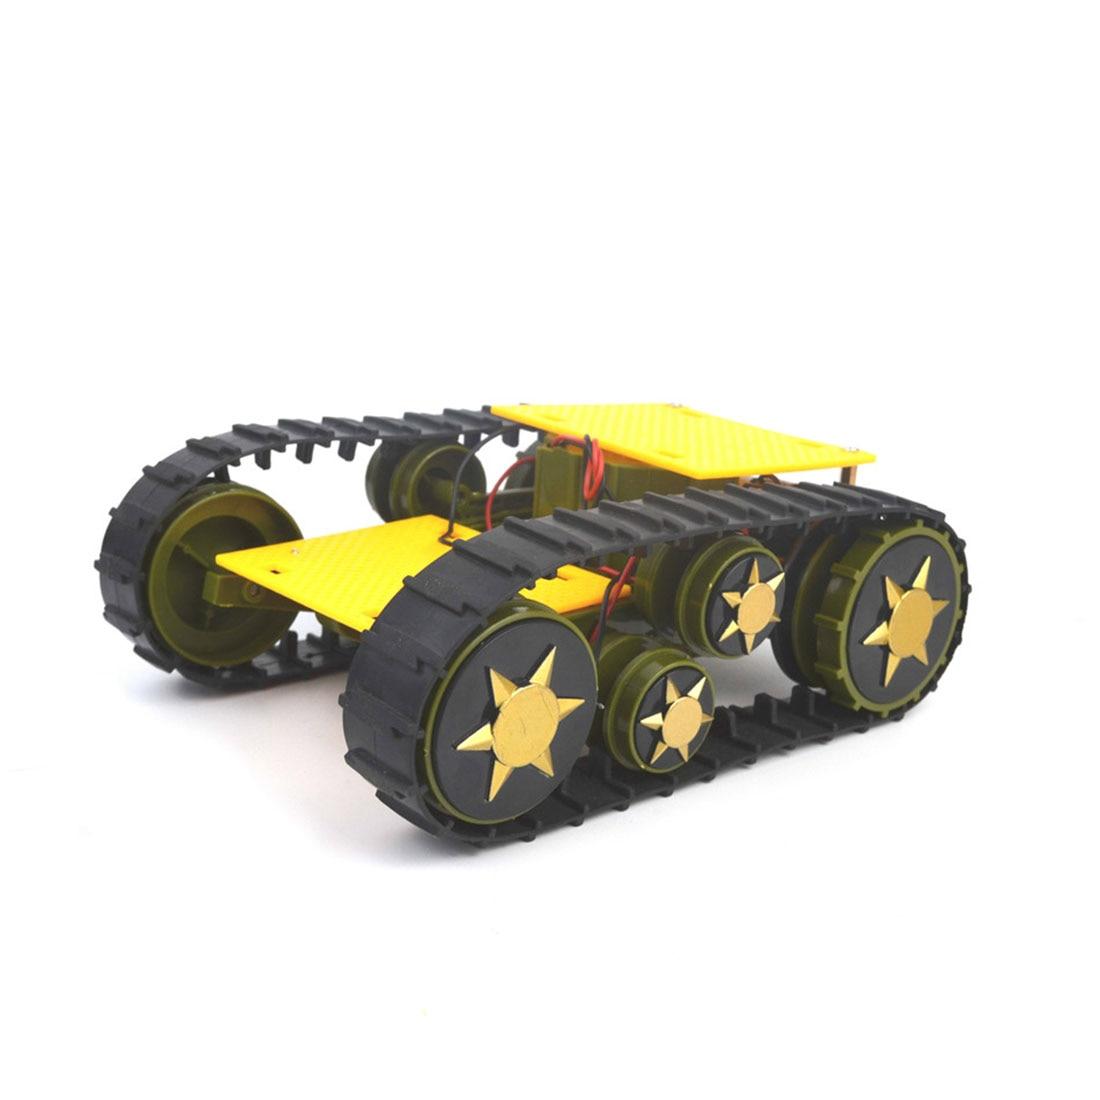 DIY Deformation Smart Intelligent Tank Robot Crawler Caterpillar Vehicle Platform For Arduino SN1900 Learning Educational Toy